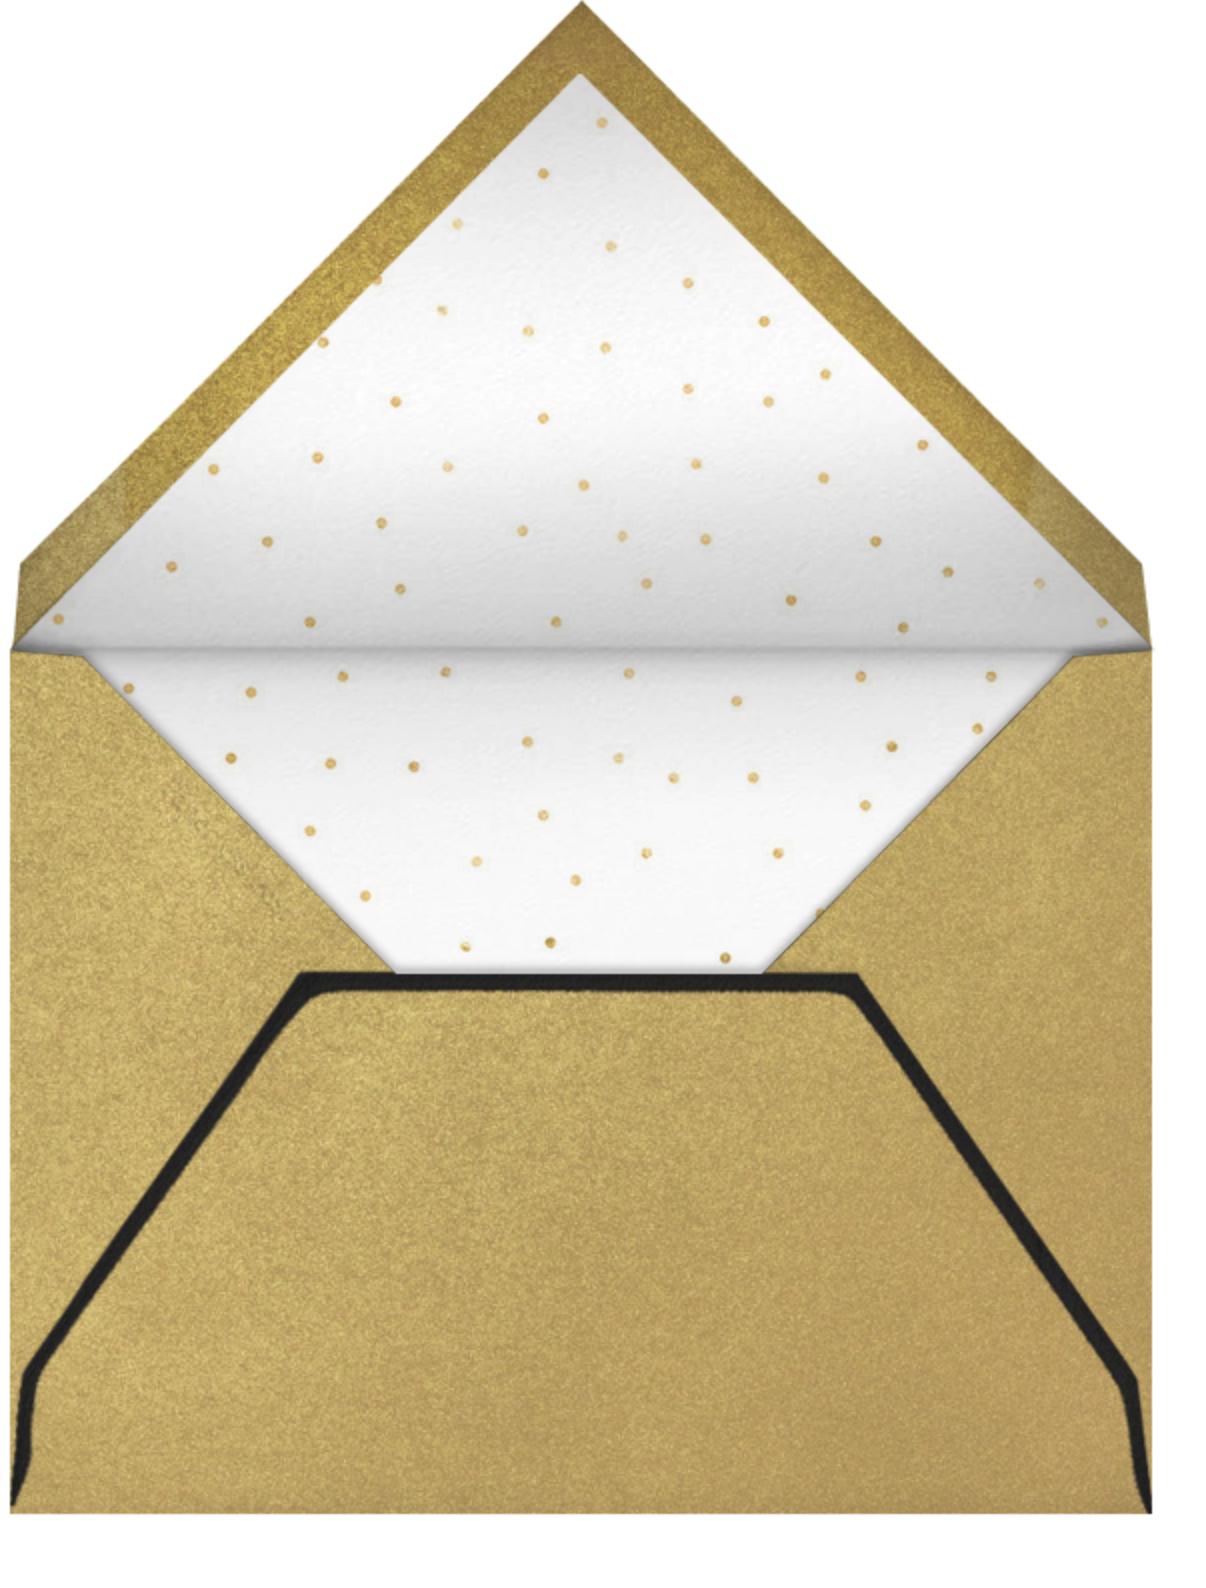 Almaviva - We're Open - Paperless Post - Professional events - envelope back